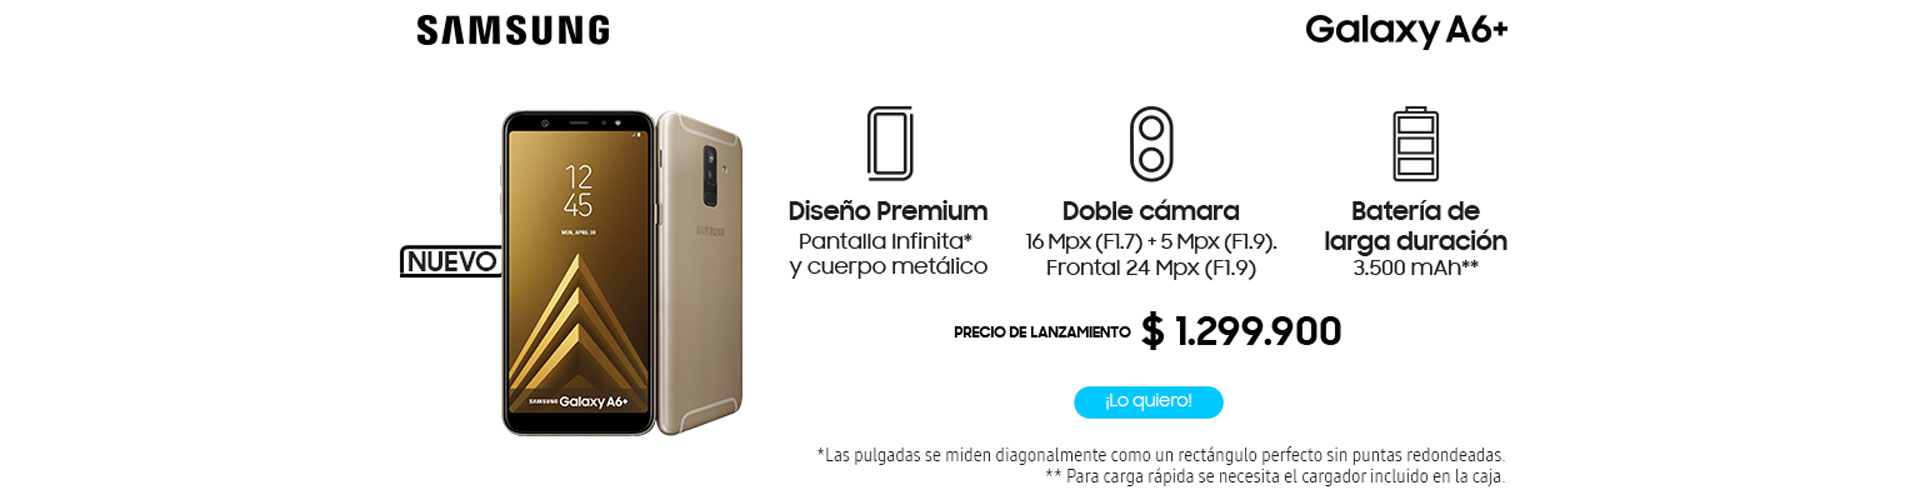 KT-PPAL-2-celulares-LNZ---Samsung-A6Plus-Jul13